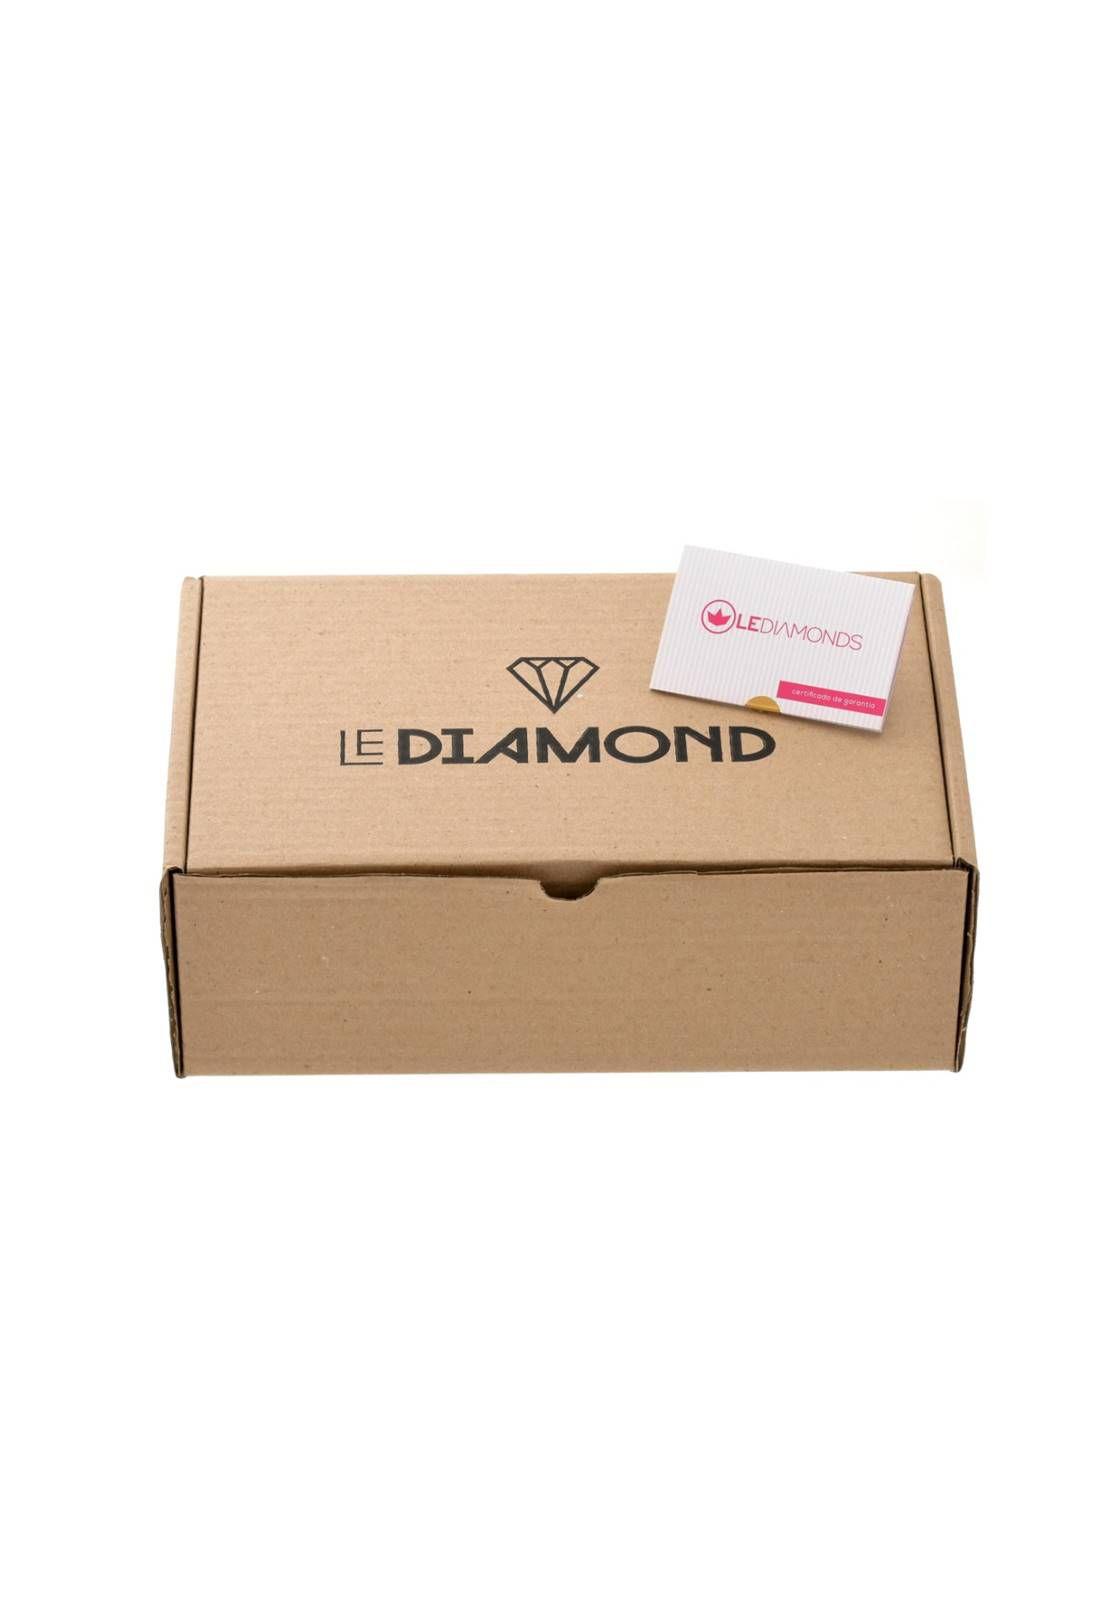 Colar Le Diamond de Resinas com Tassel Multicolorido